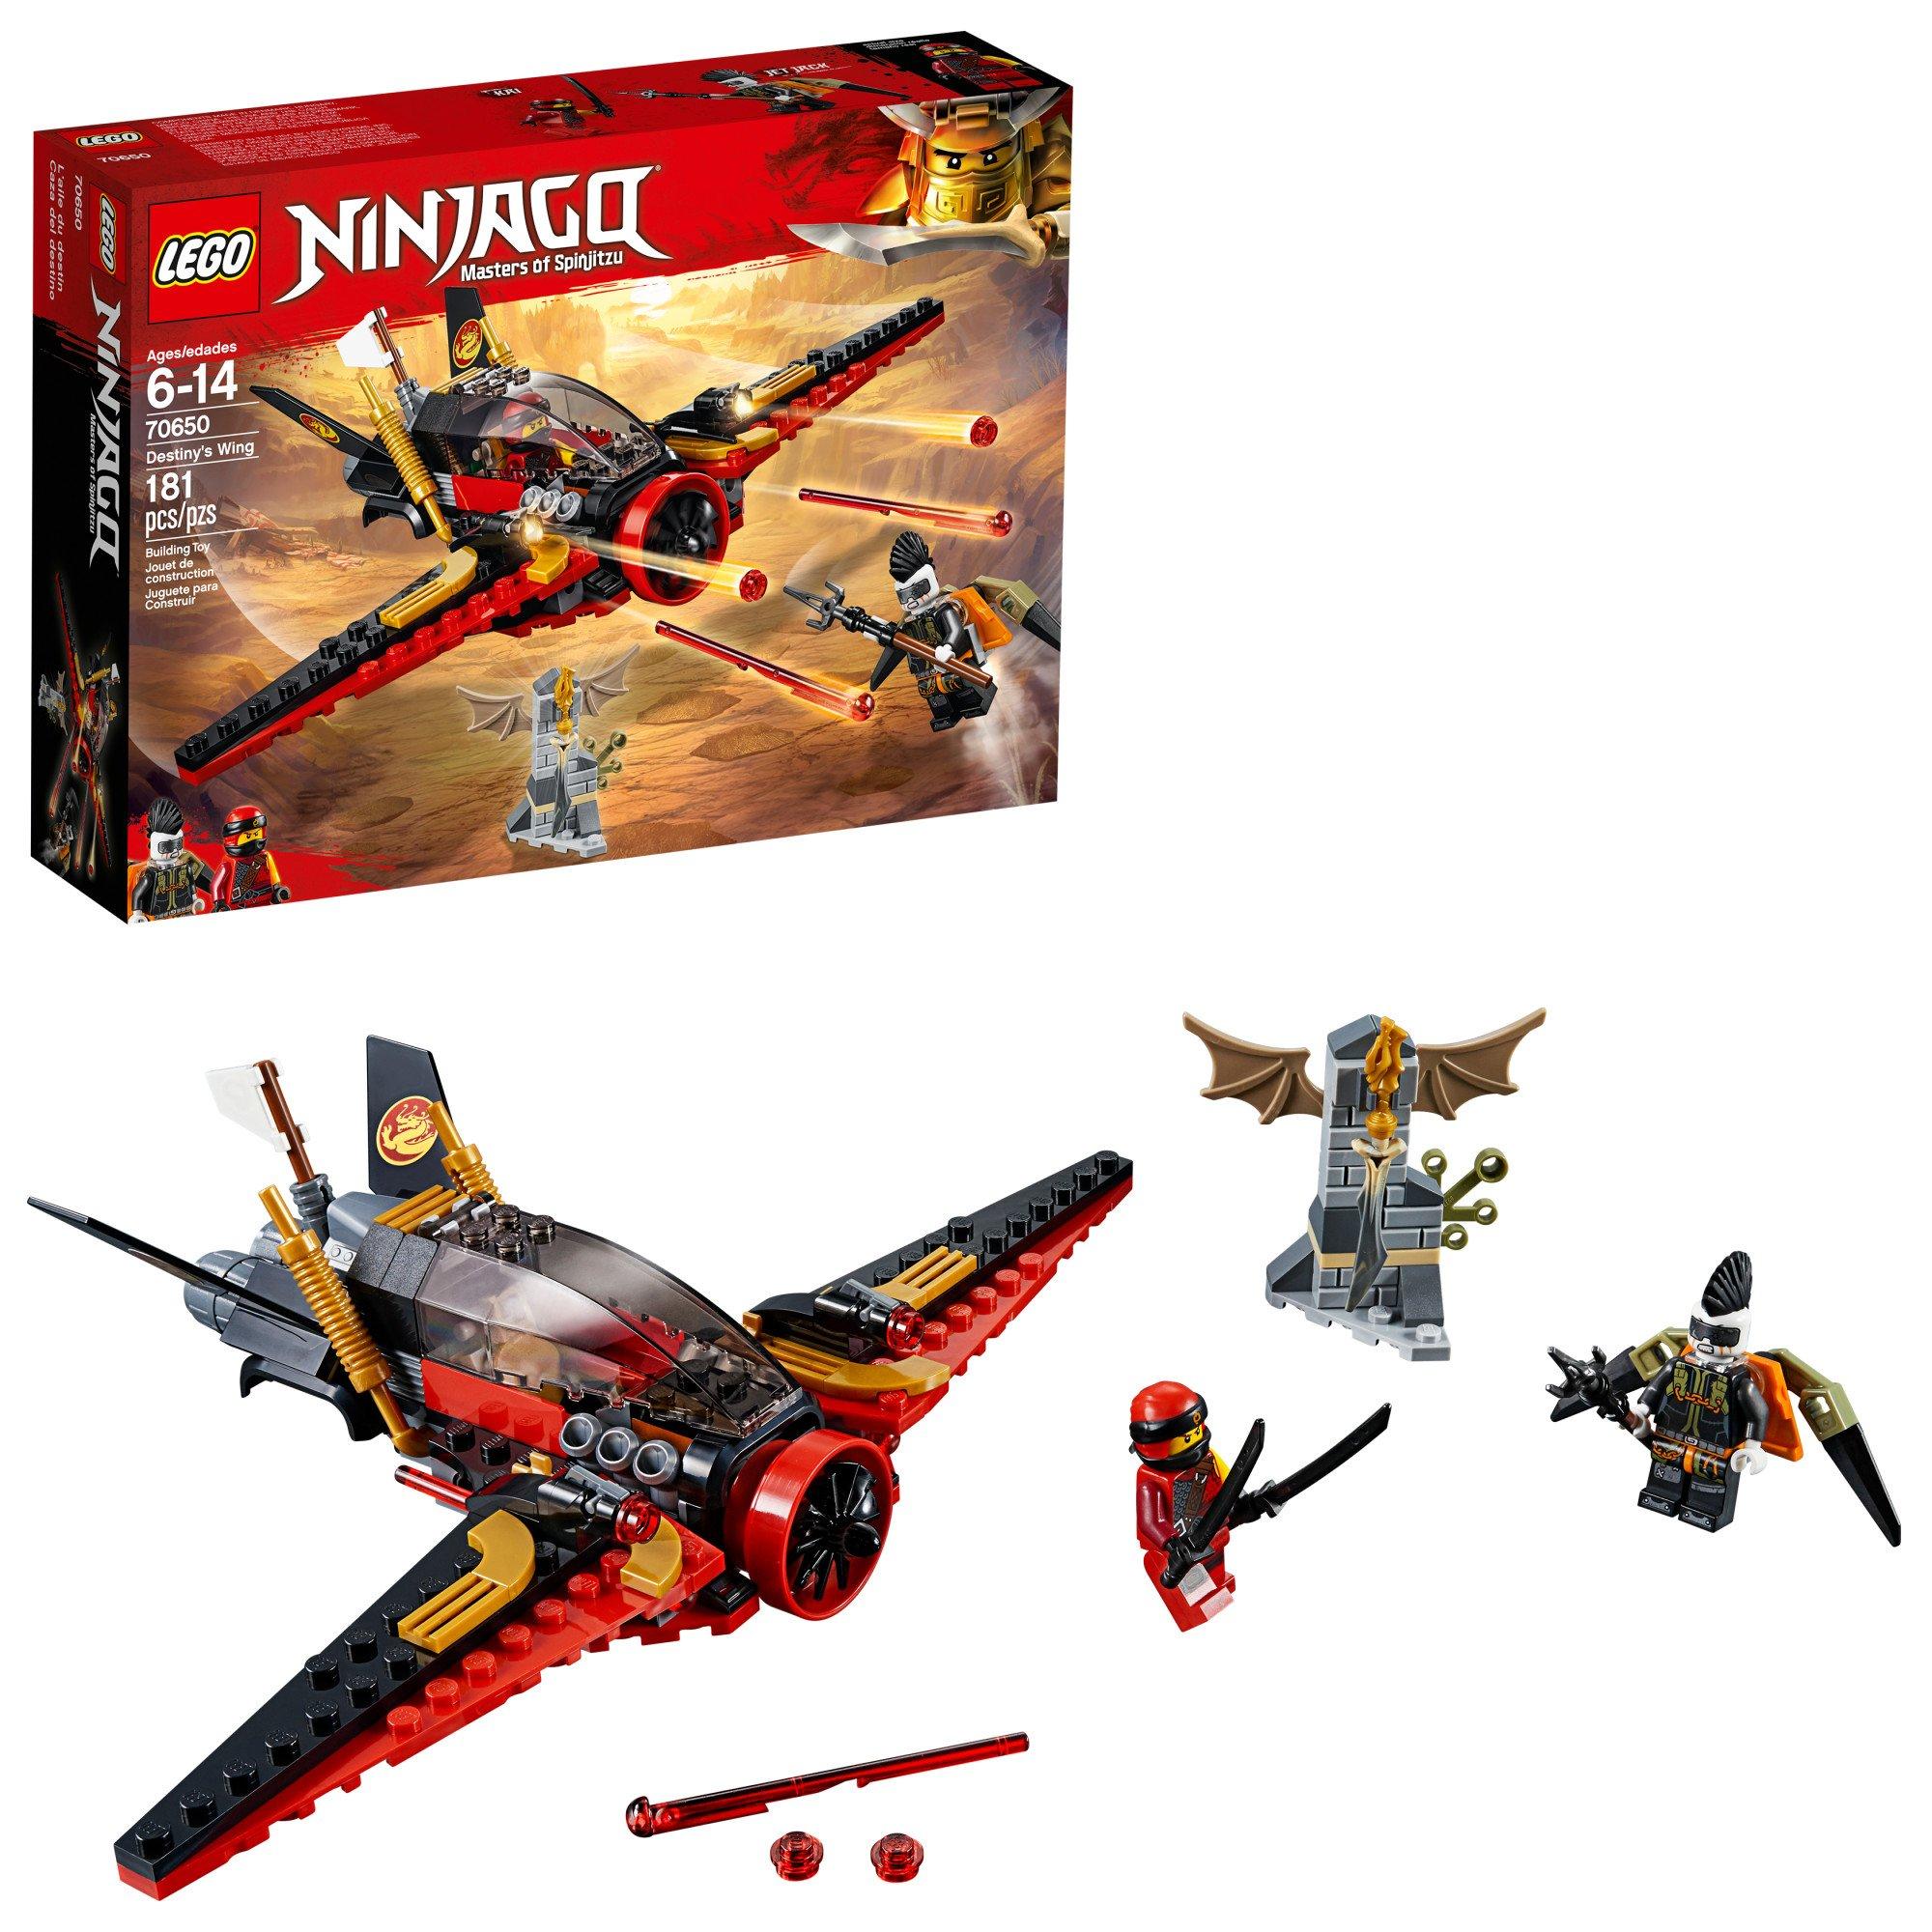 LEGO NINJAGO Masters of Spinjitzu: Destiny's Wing 70650 Building Kit (181 Piece)